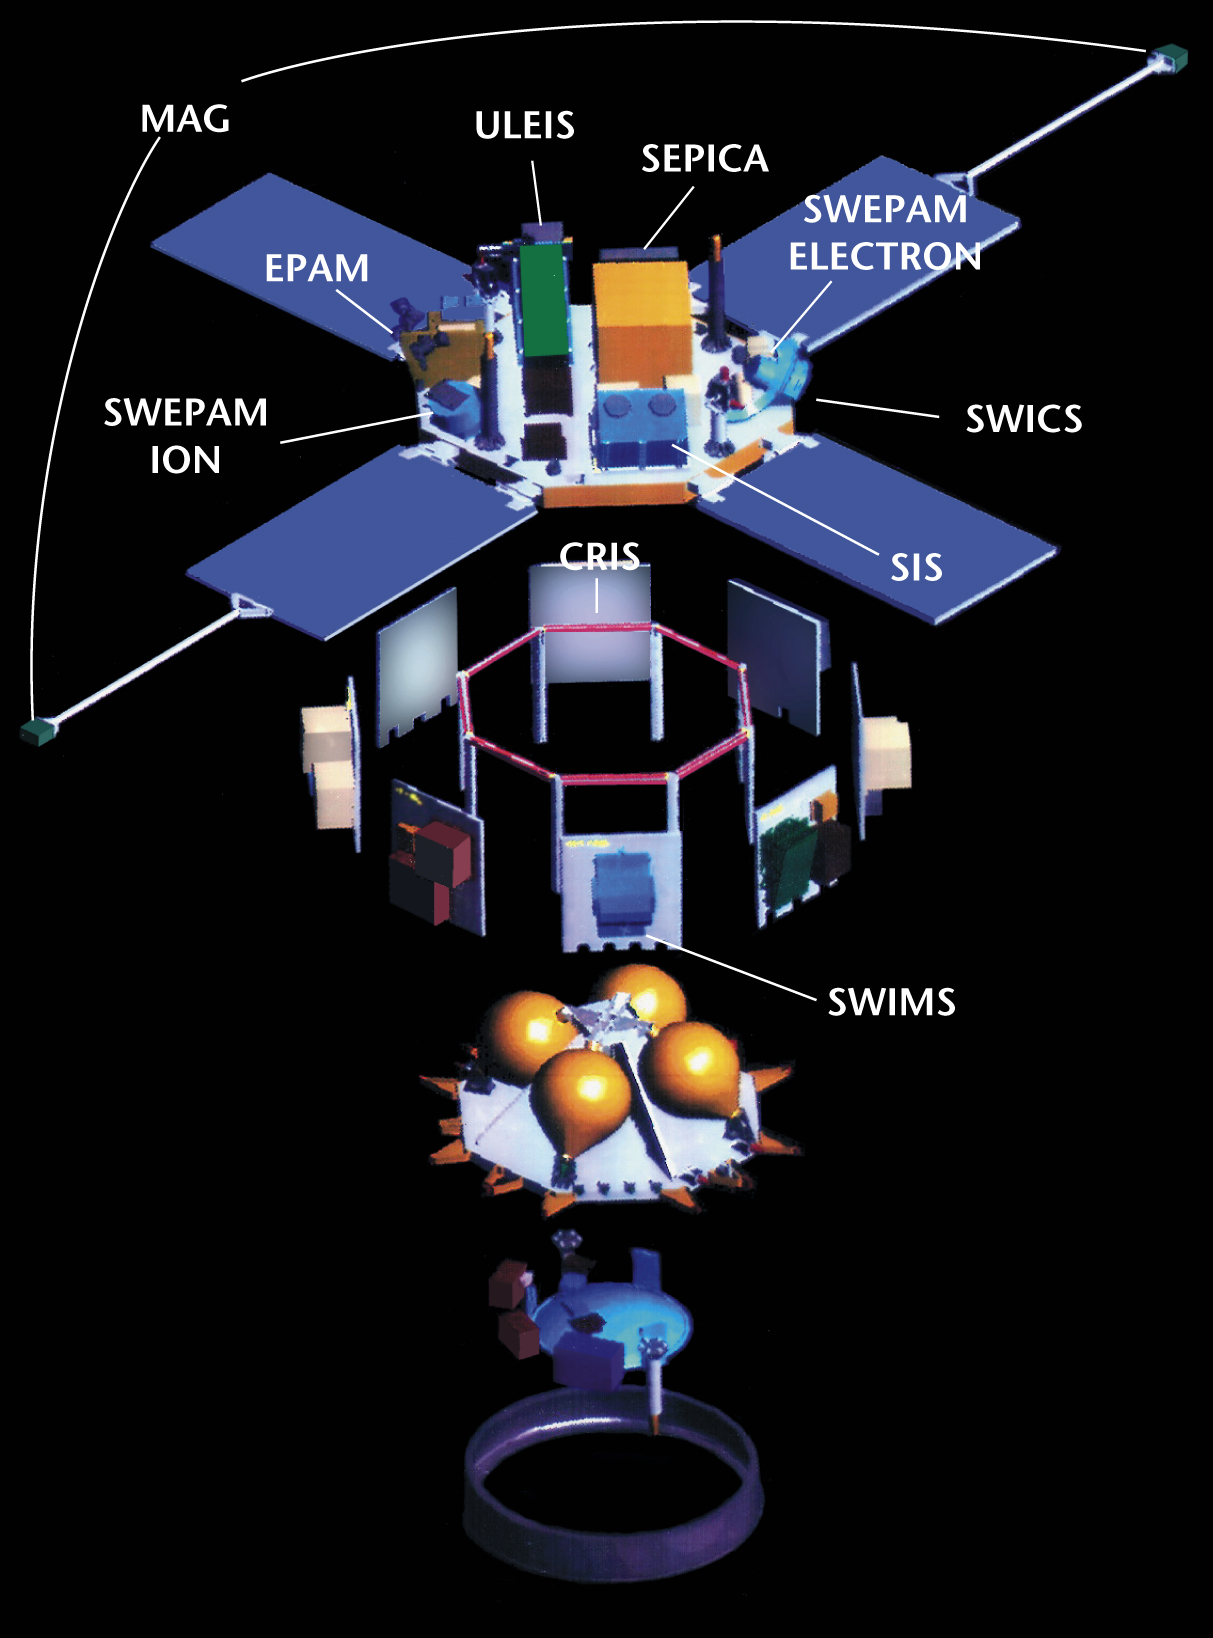 NASA - ACE, Workhorse Of NASA's Heliophysics Fleet, Is 15